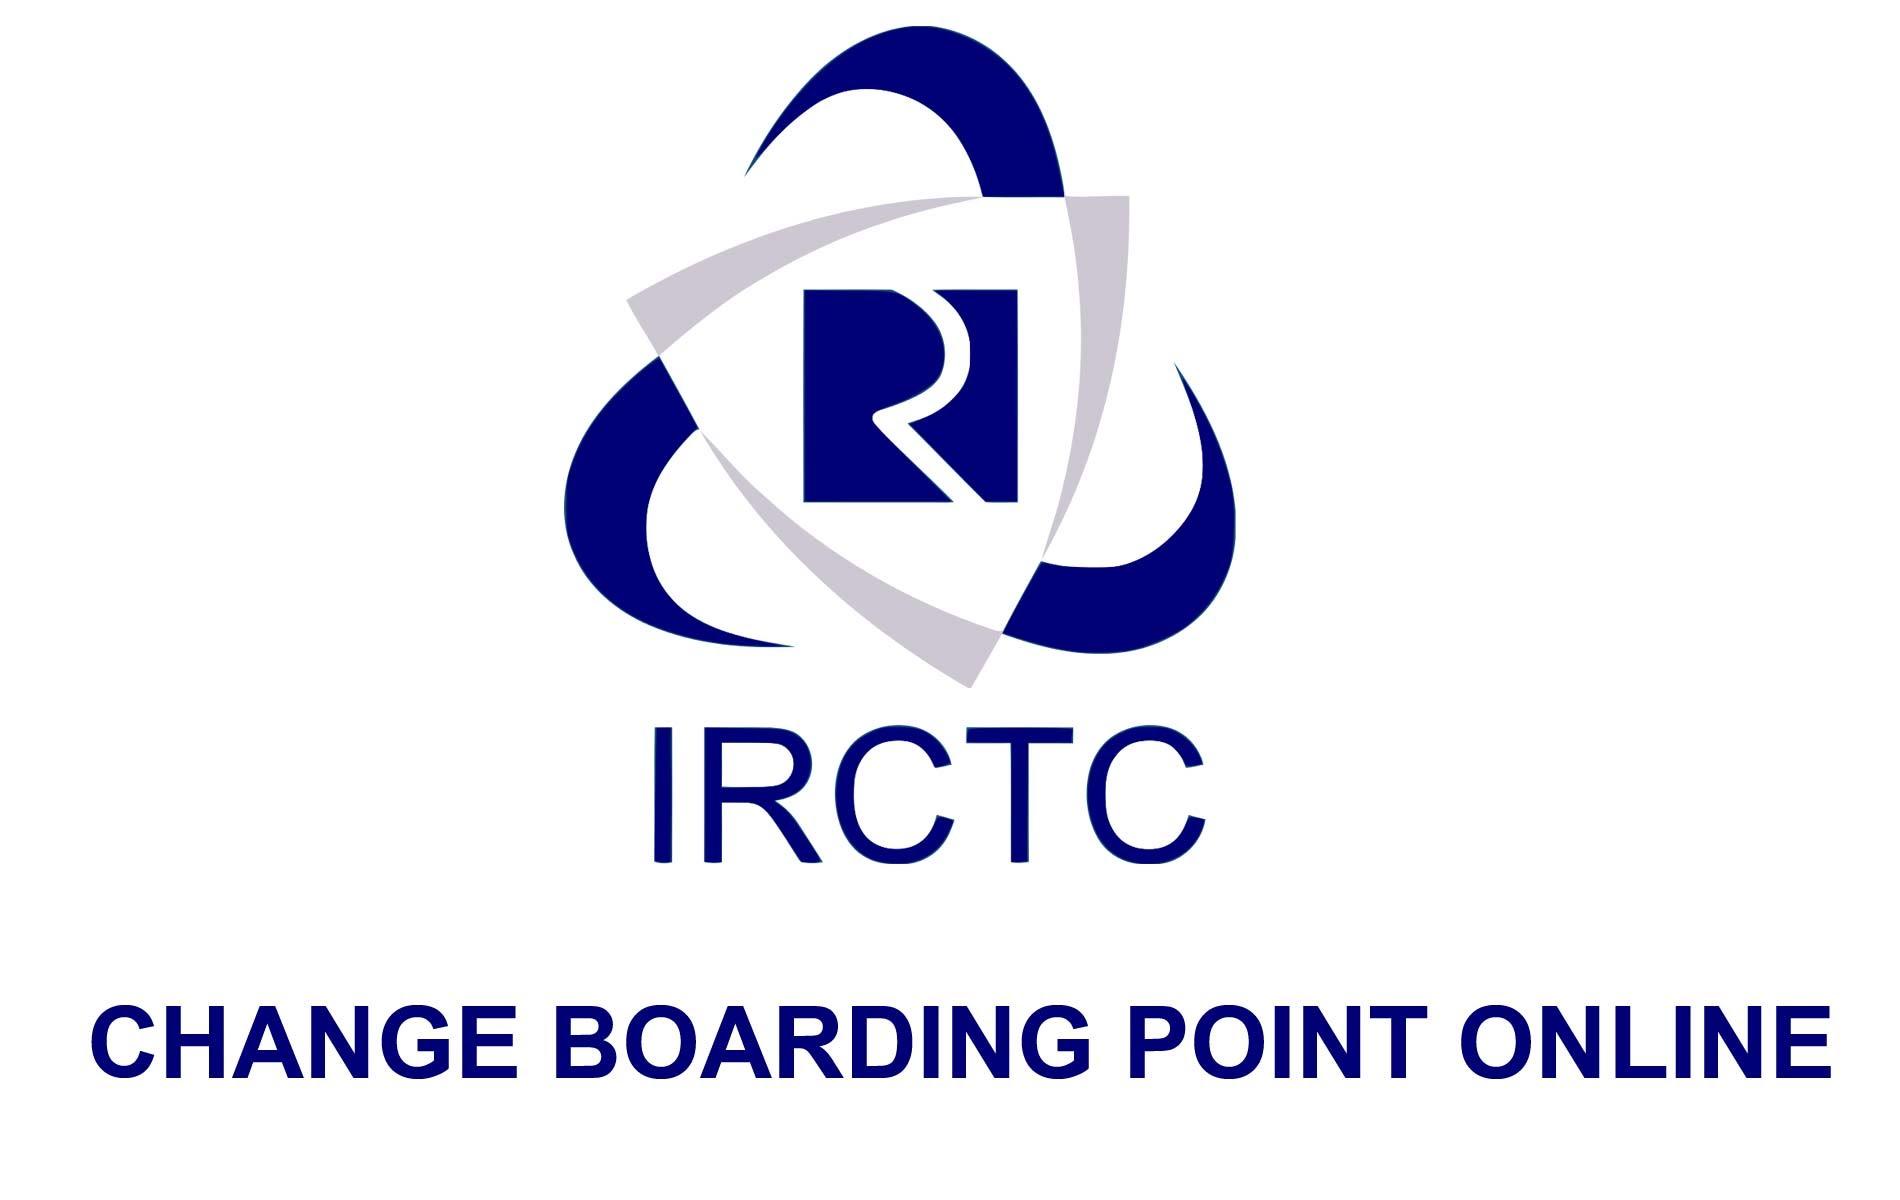 how to change boarding point in railway ticket online?